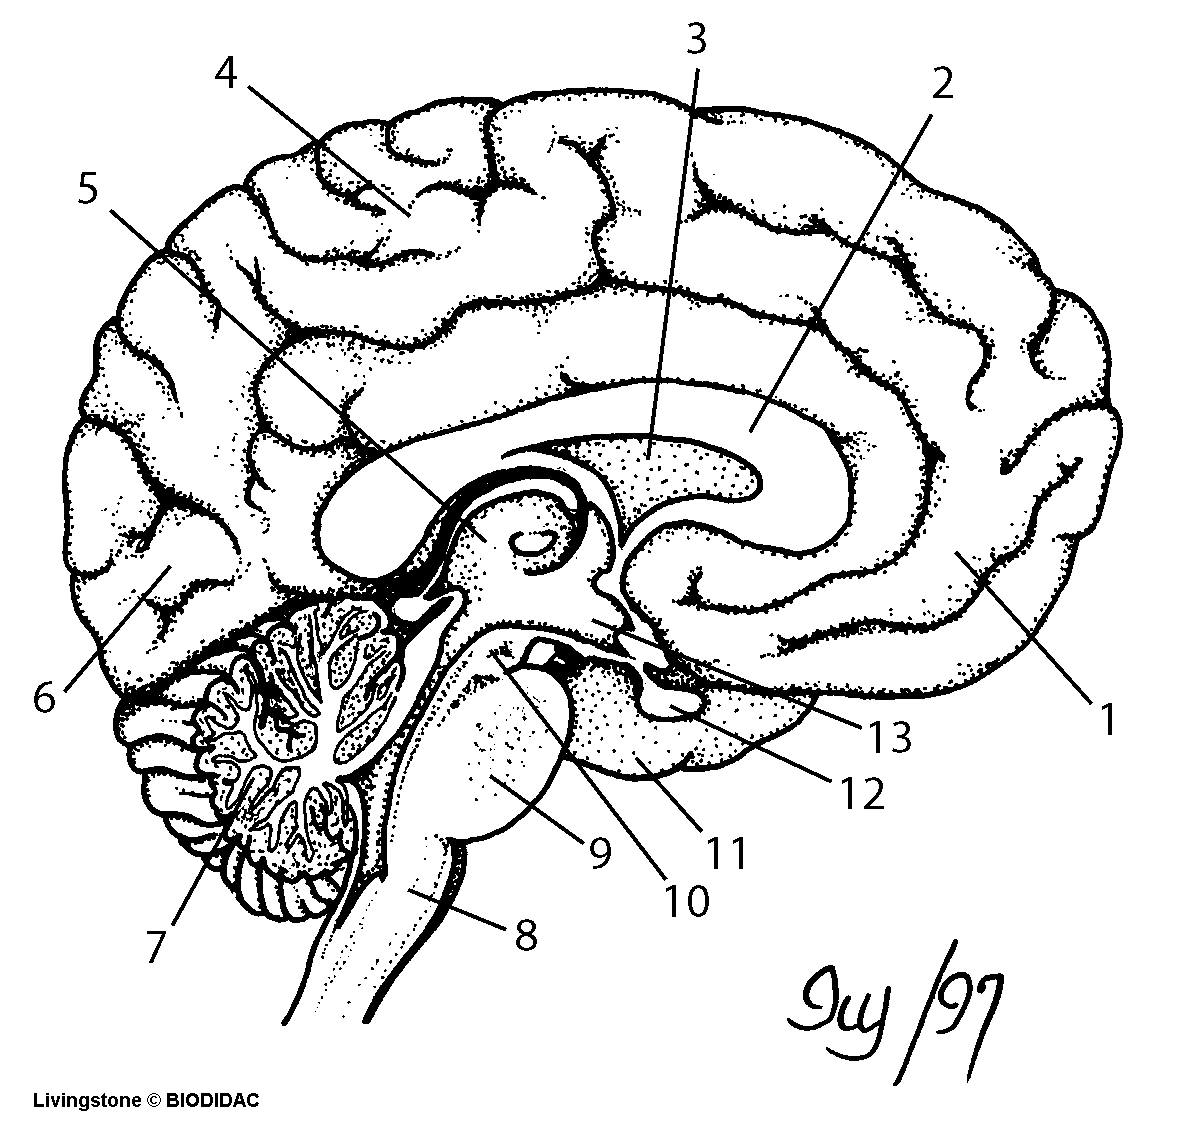 Ear Diagram Unlabeled